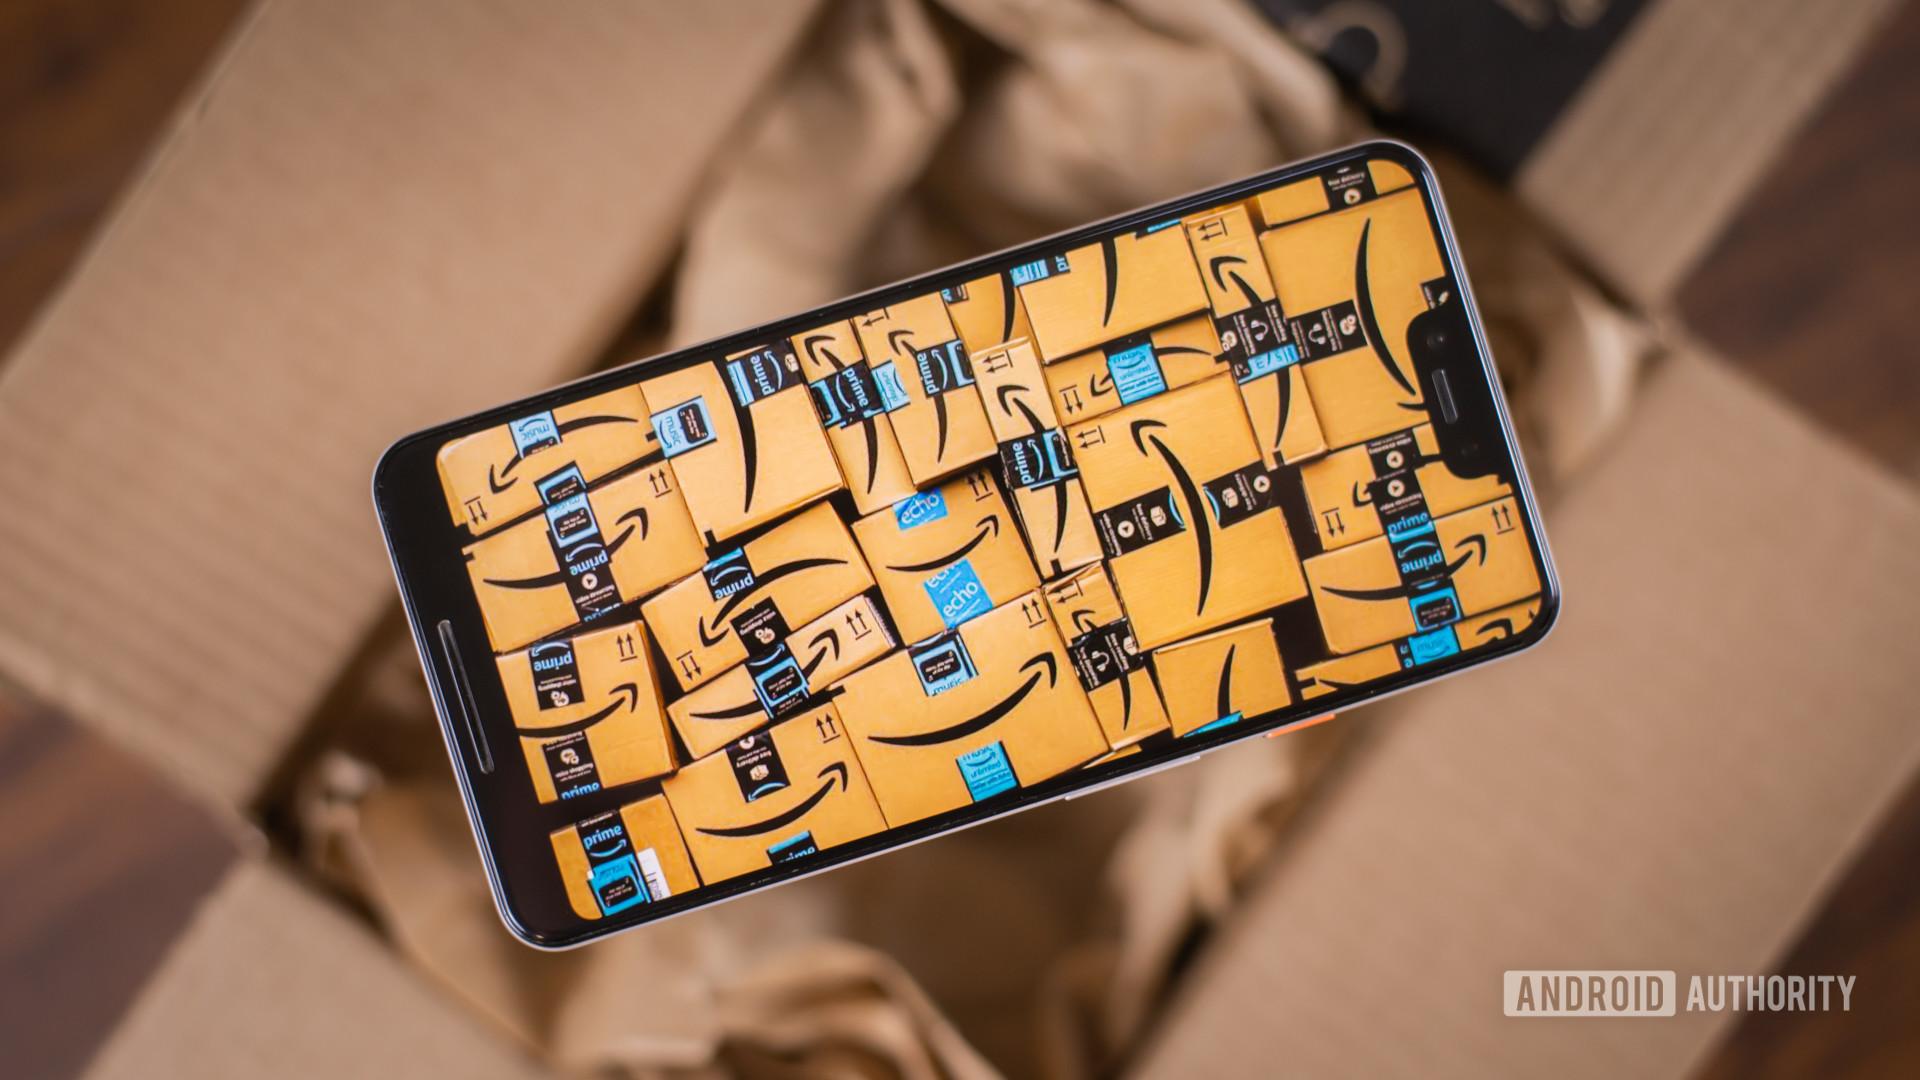 Amazon Prime boxes with smartphone 1